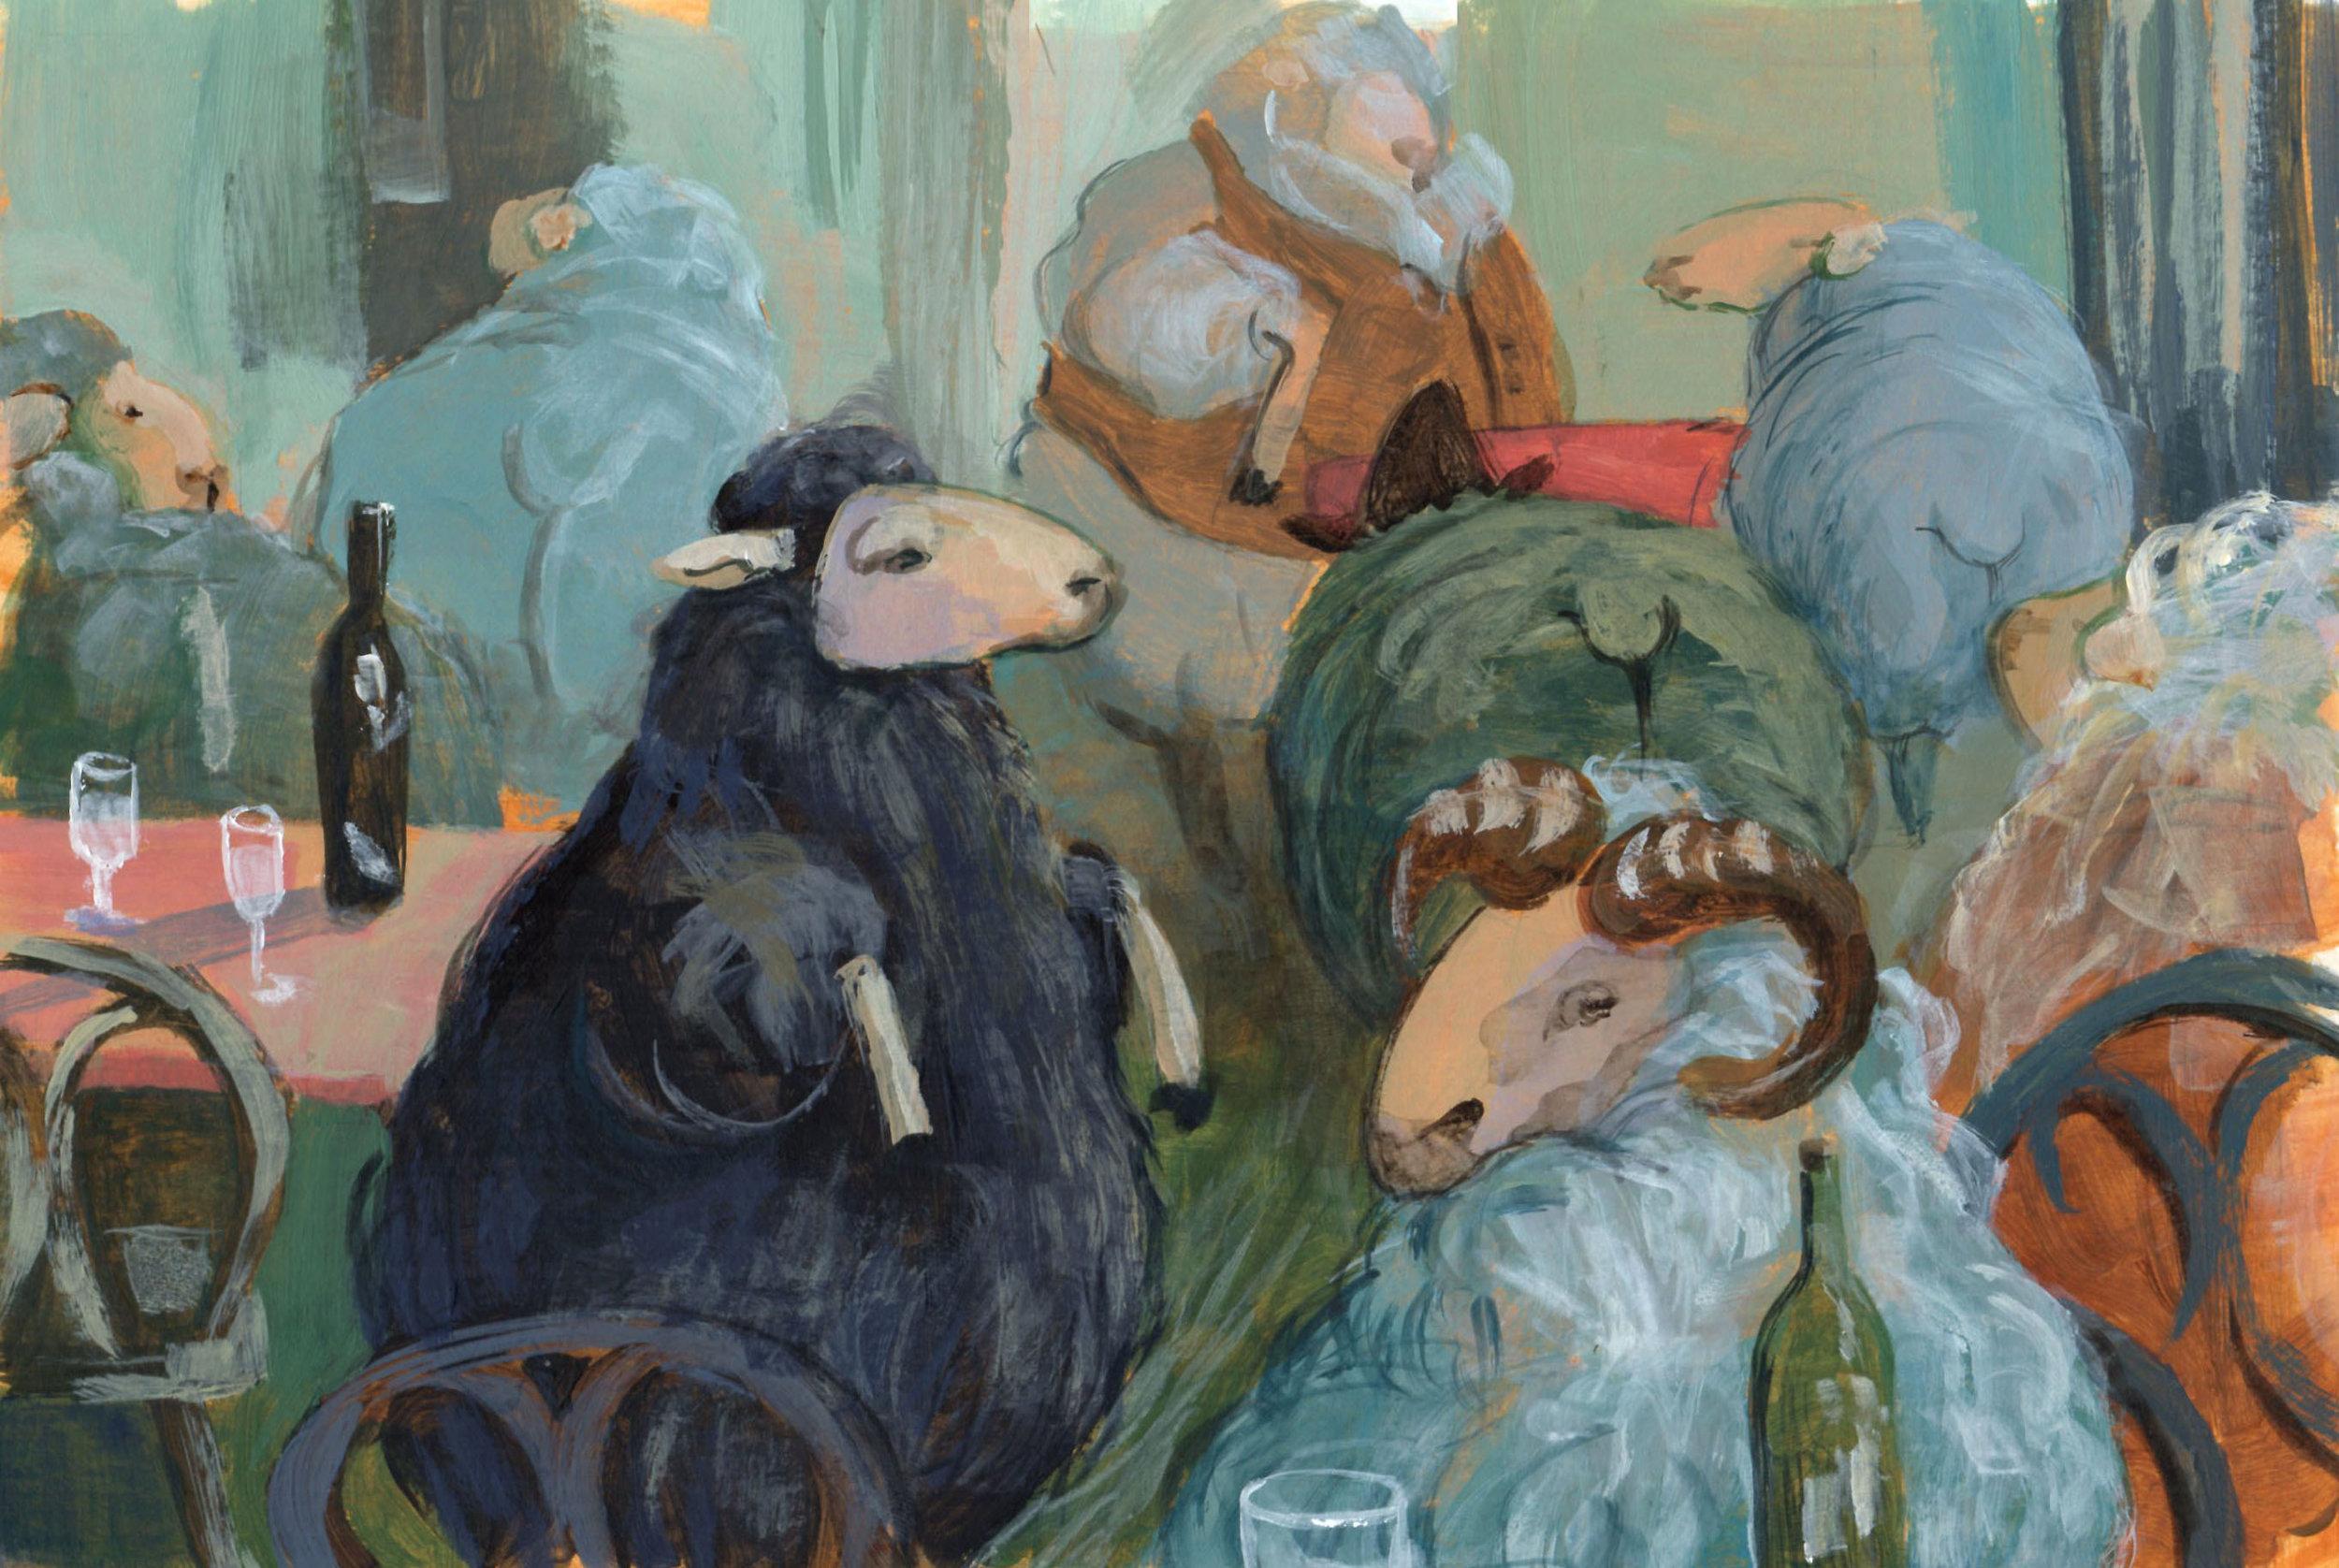 Sheep Lautrec Study 2_001.jpg